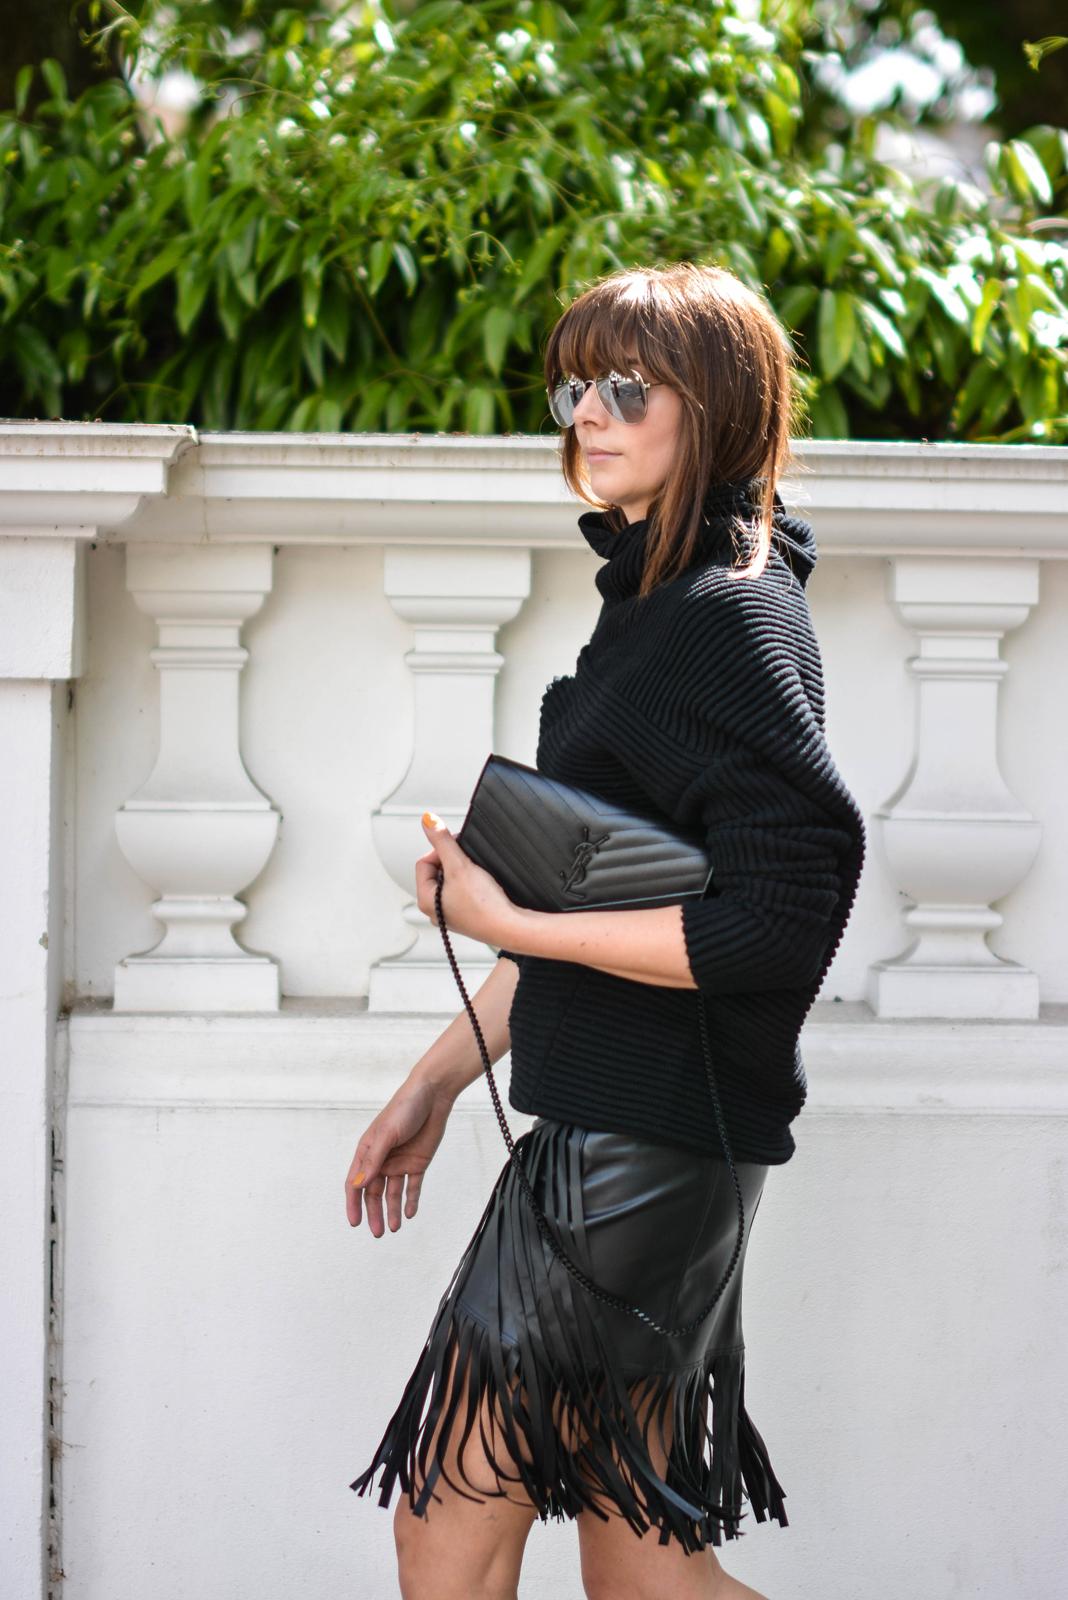 EJSTYLE - Emma Hill wears River Island faux leather fringe tassel skirt, Romwe black jumper, YSL quilted envelope clutch bag, all black OOTD